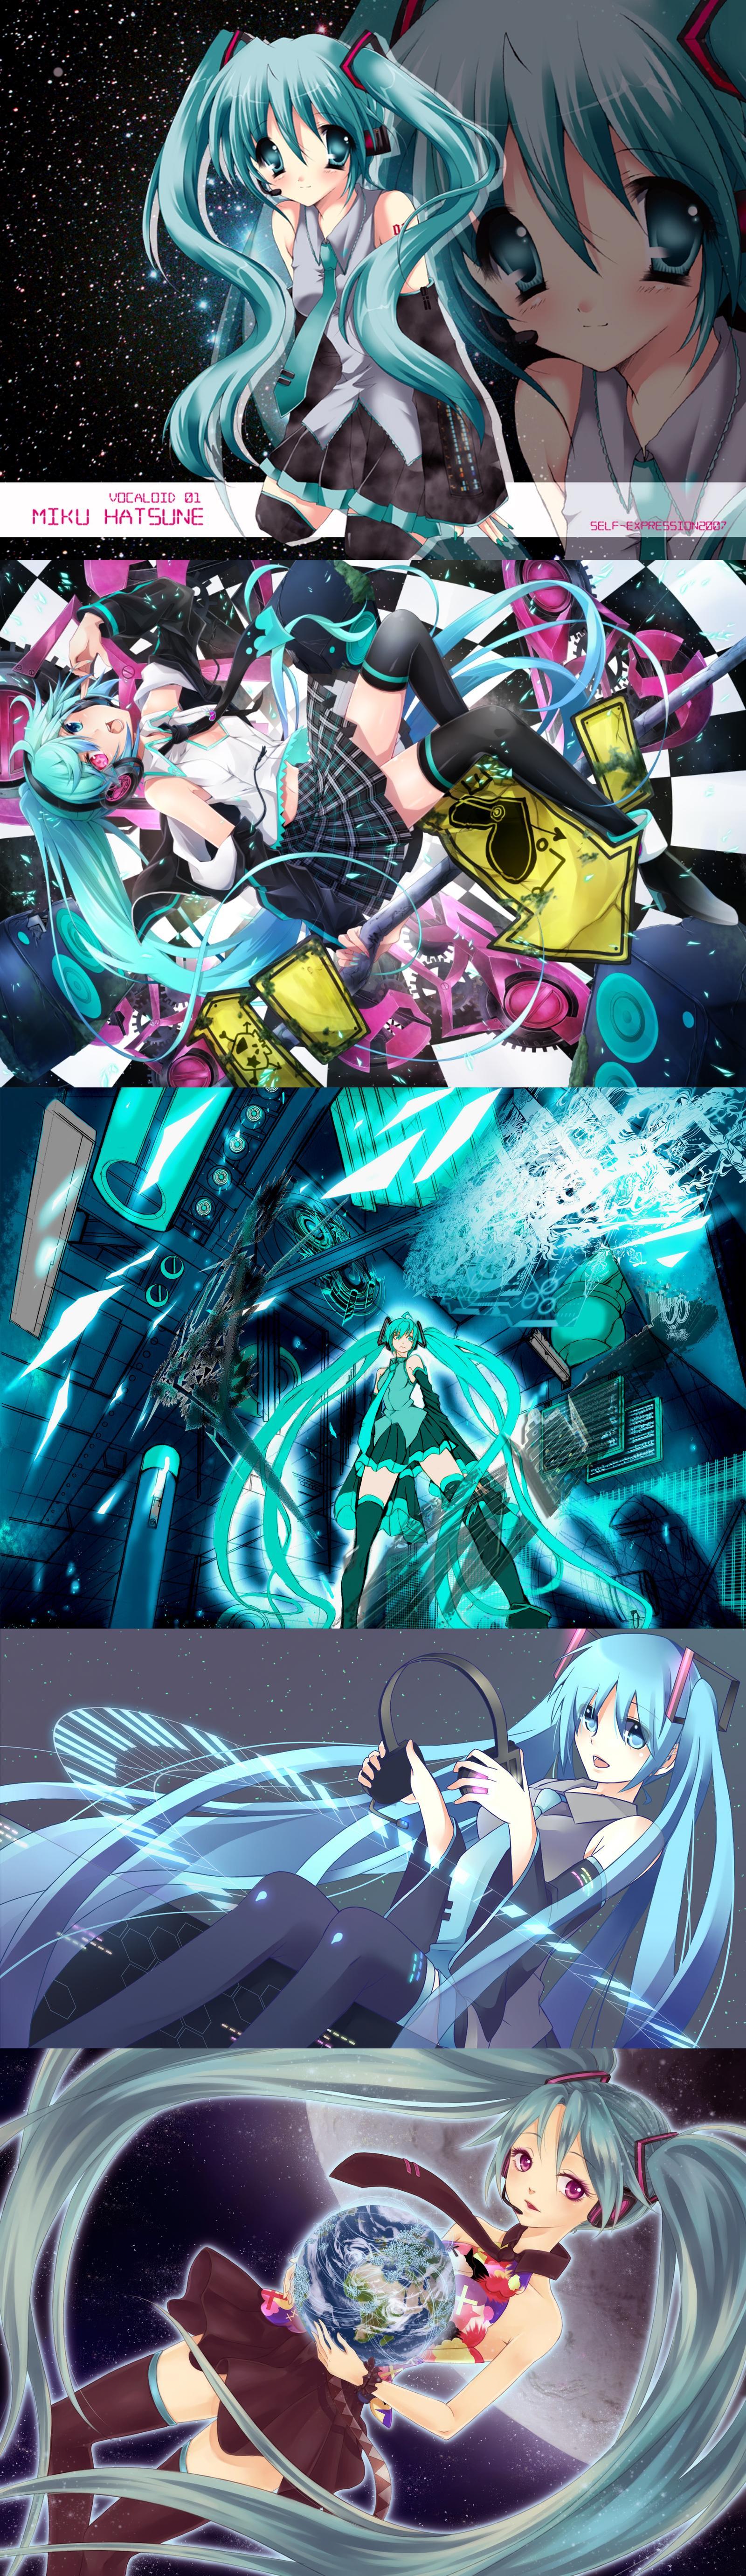 Hatsune Miku Headphone Anime wallpapers Download 960